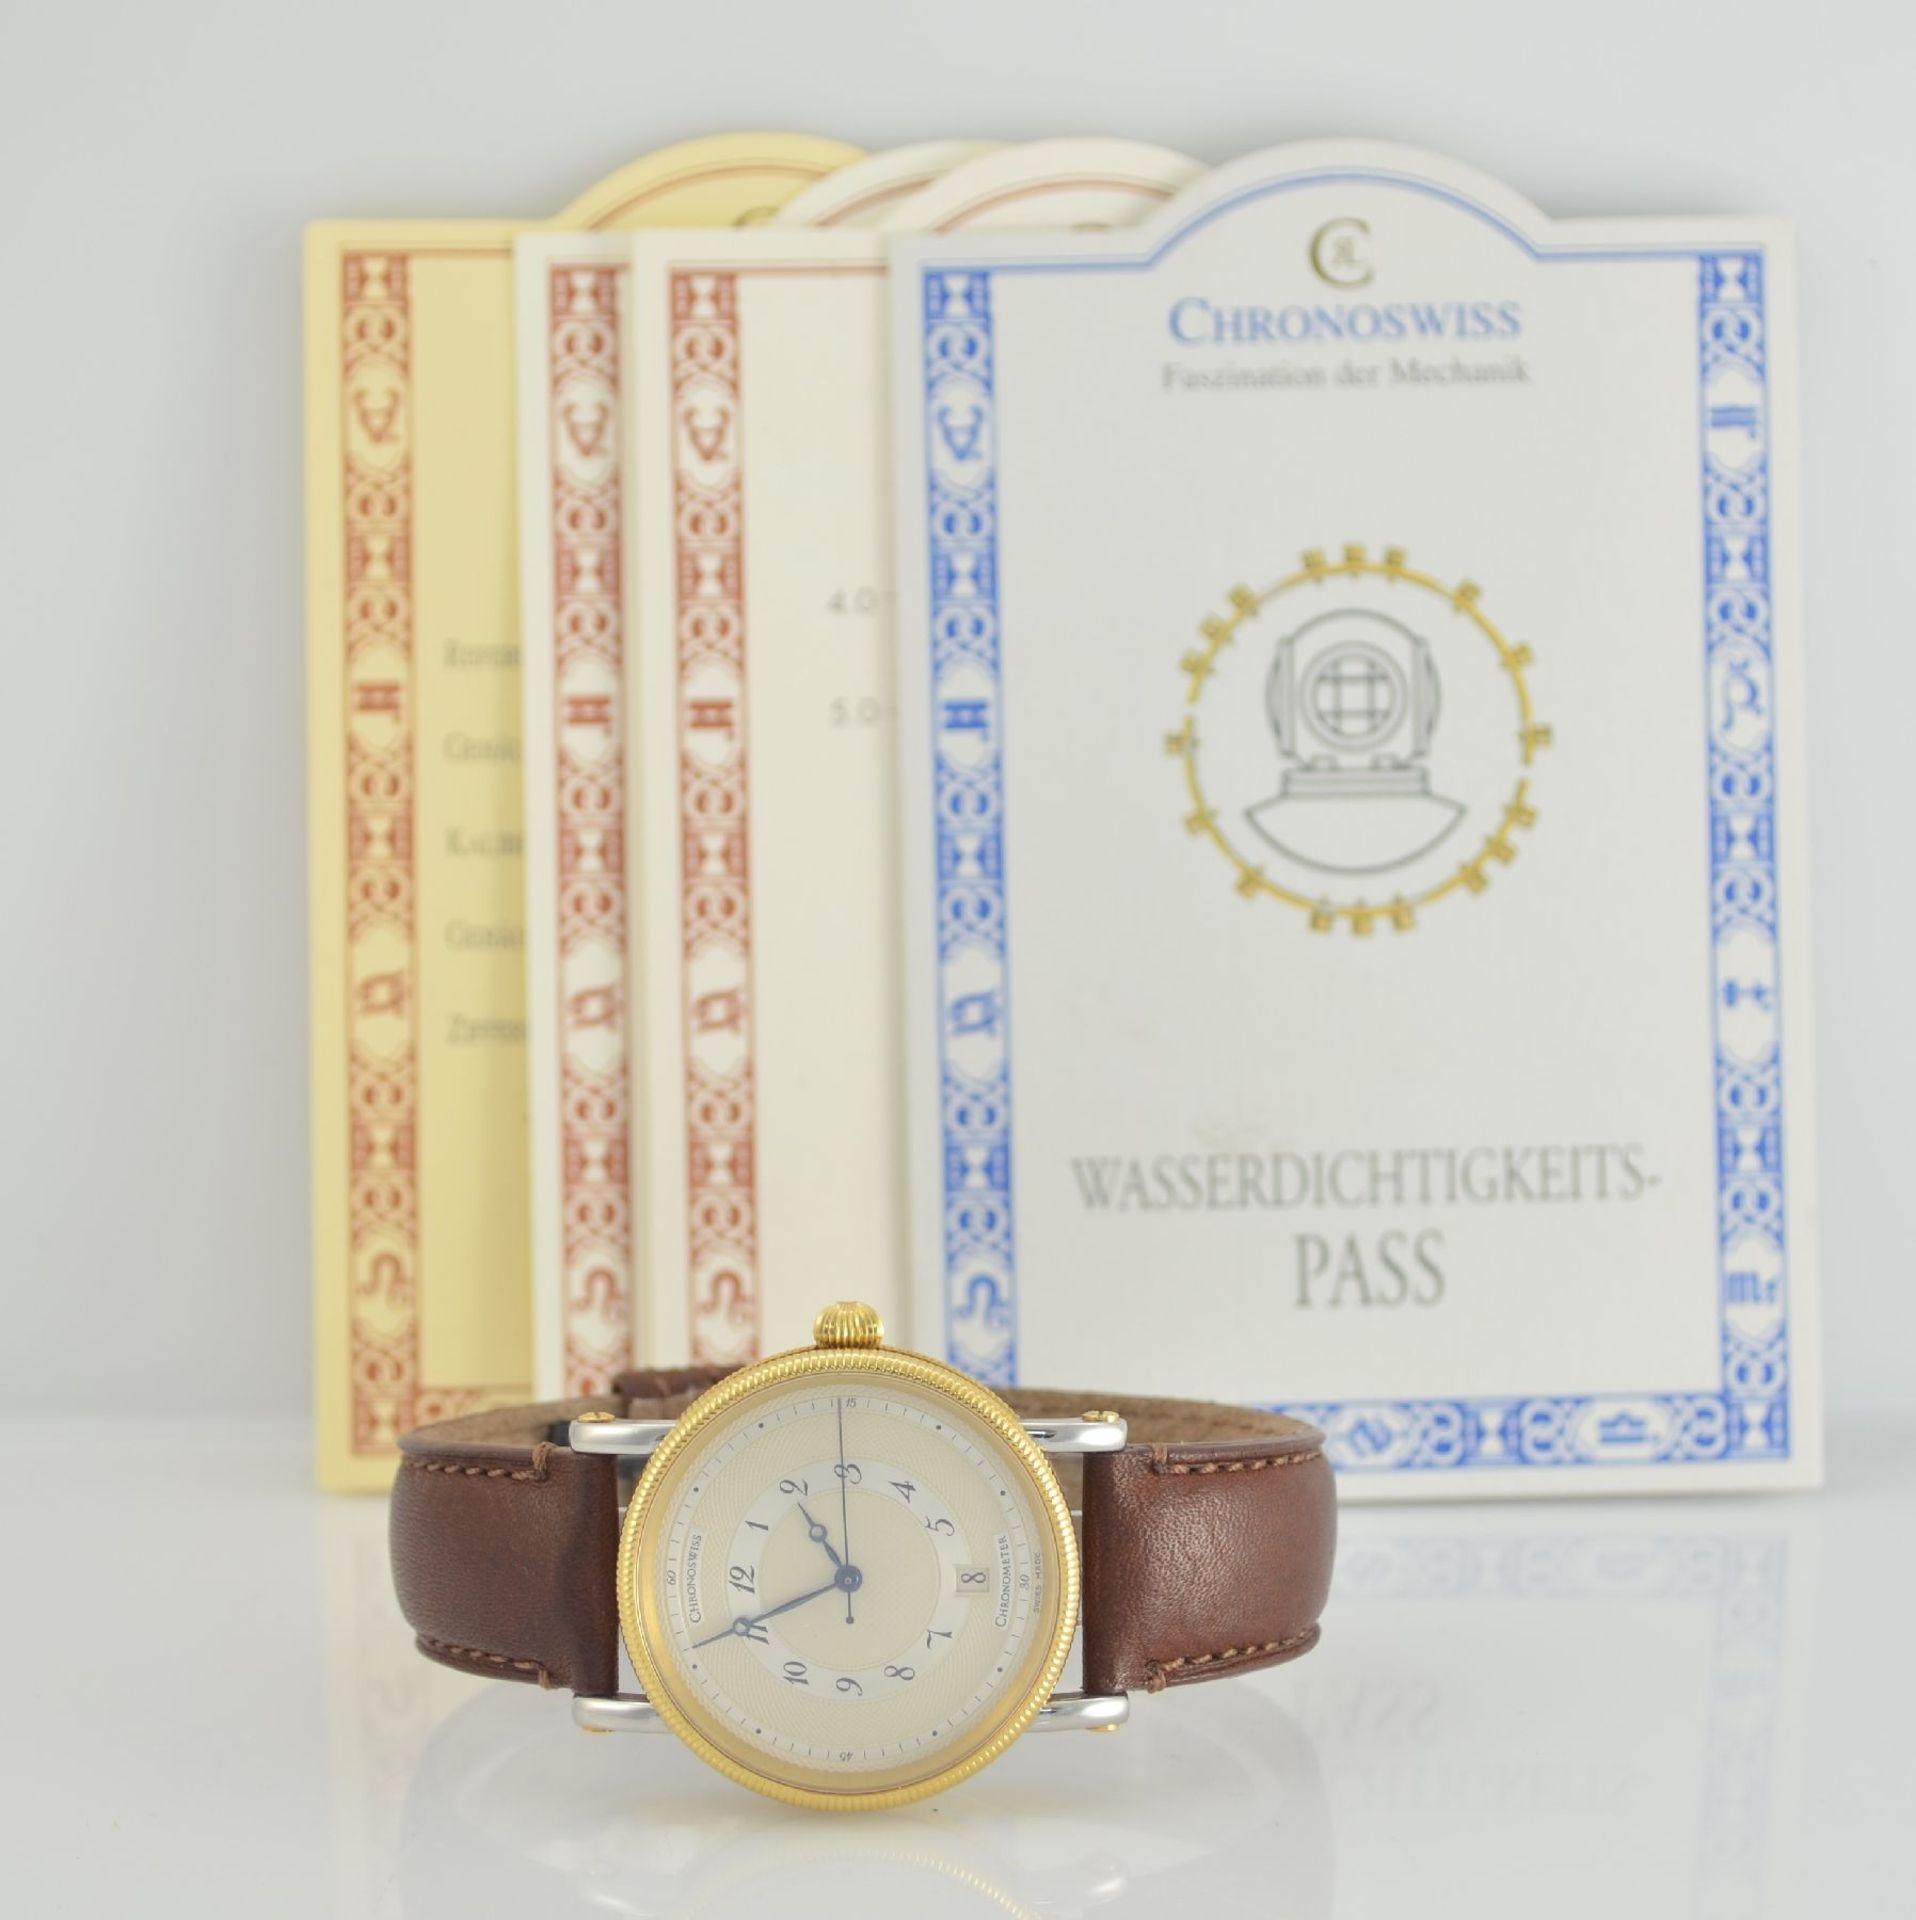 CHRONOSWISS Chronometer Herrenarmbanduhr, Automatik, Ref. CH 2822, Edelstahl/Gold kombiniert inkl. - Bild 7 aus 7